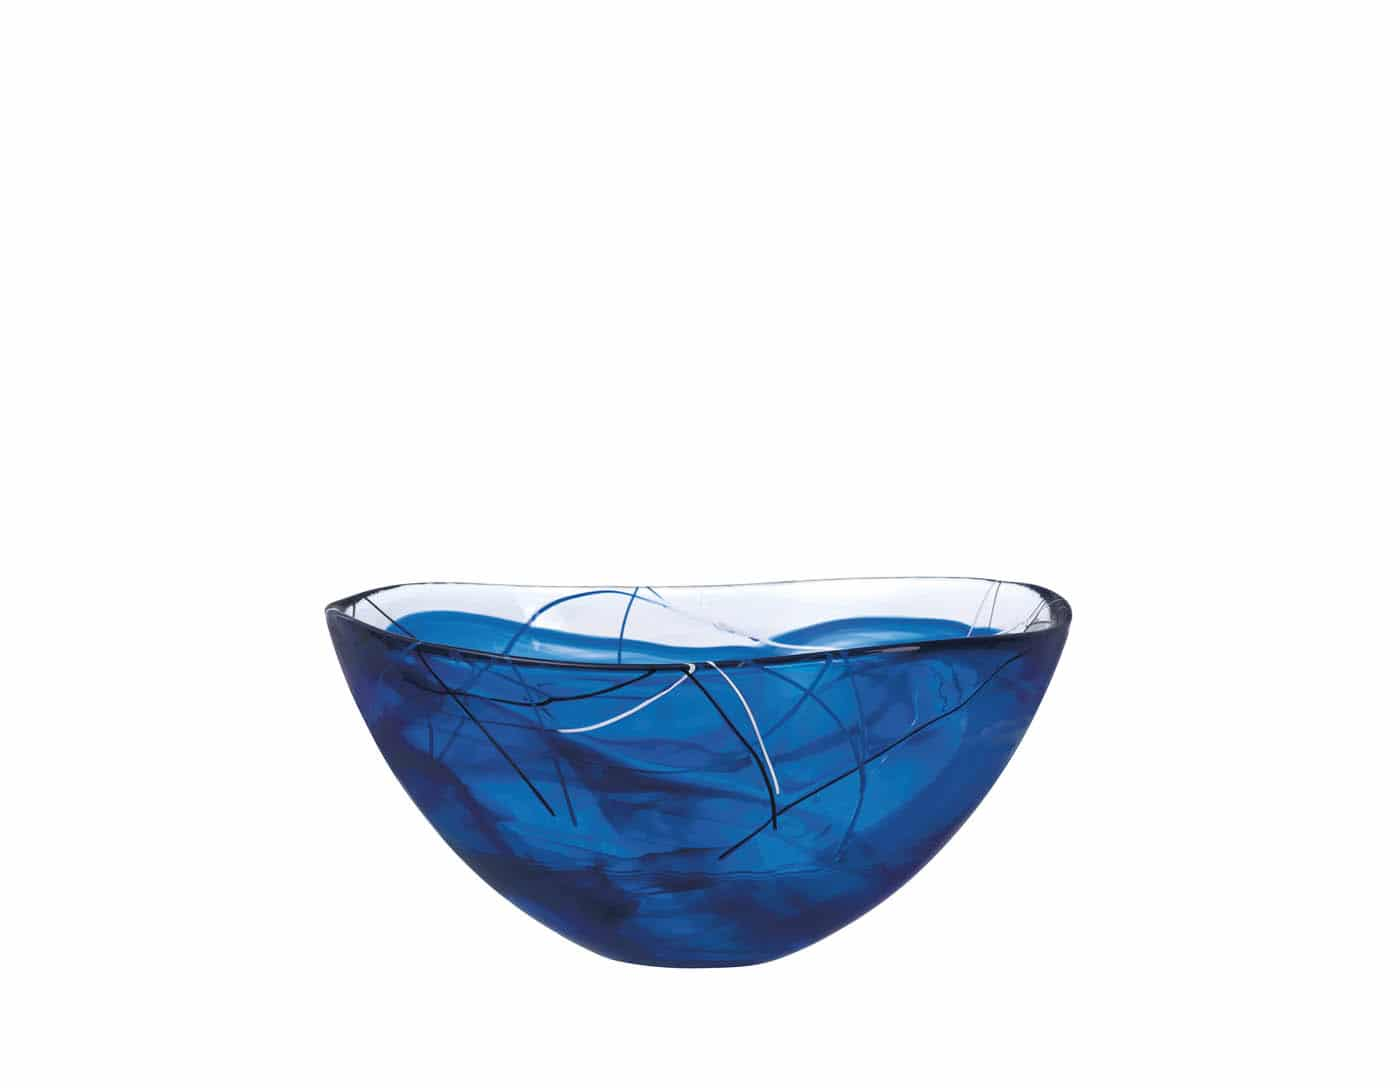 Anna Ehrner - Blå skål